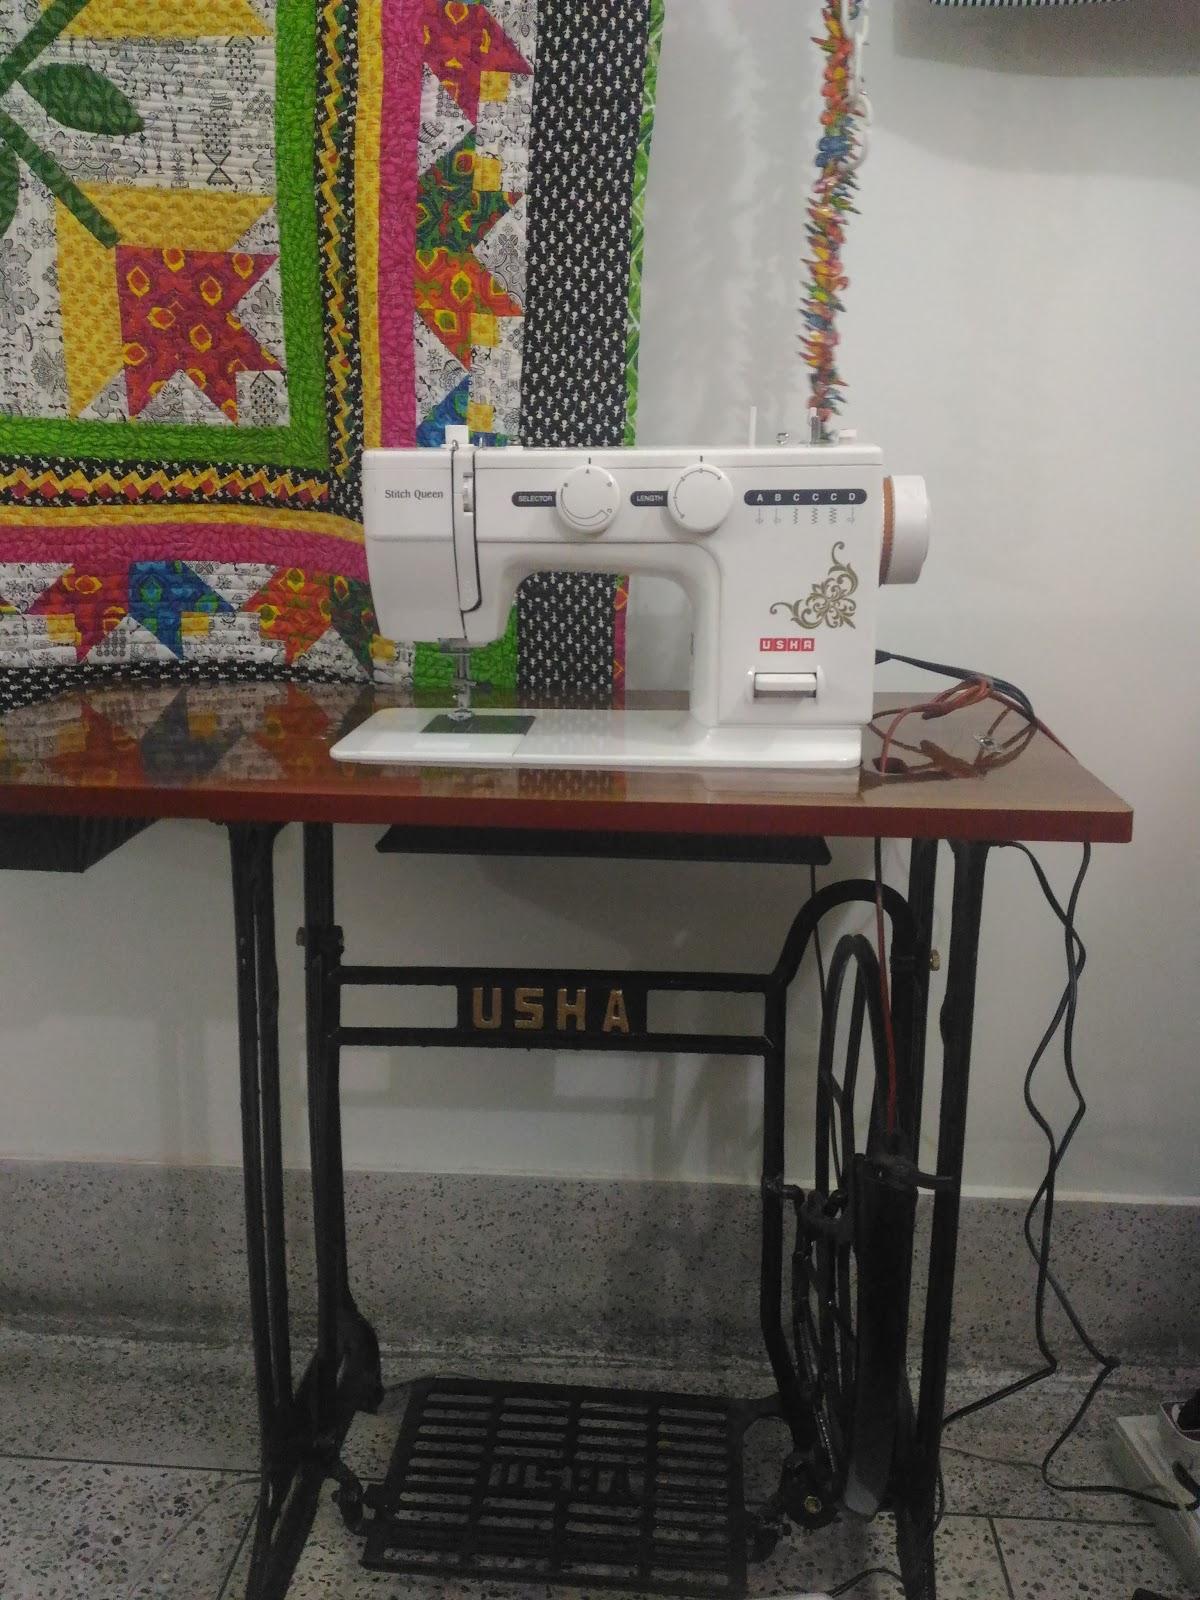 dbea301bd1f0 Sewing Machines Usha International